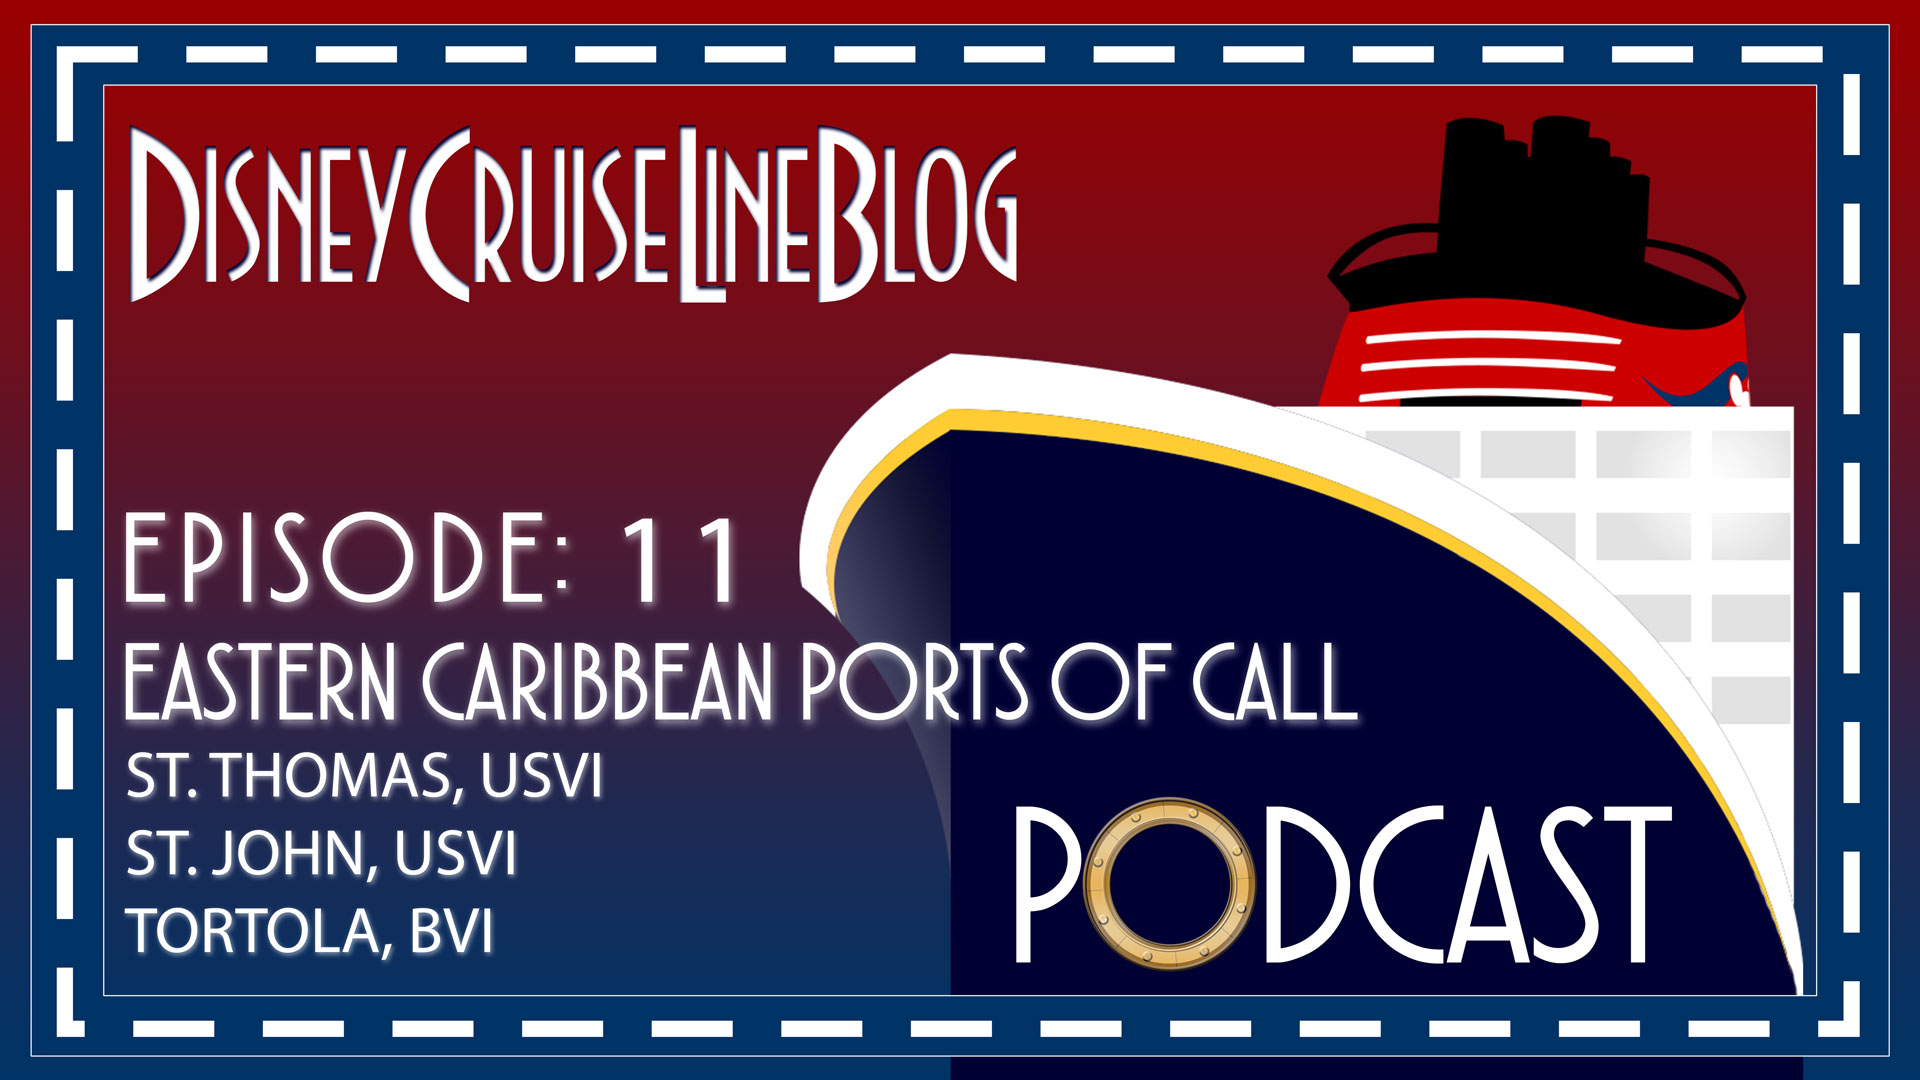 St John The Disney Cruise Line Blog